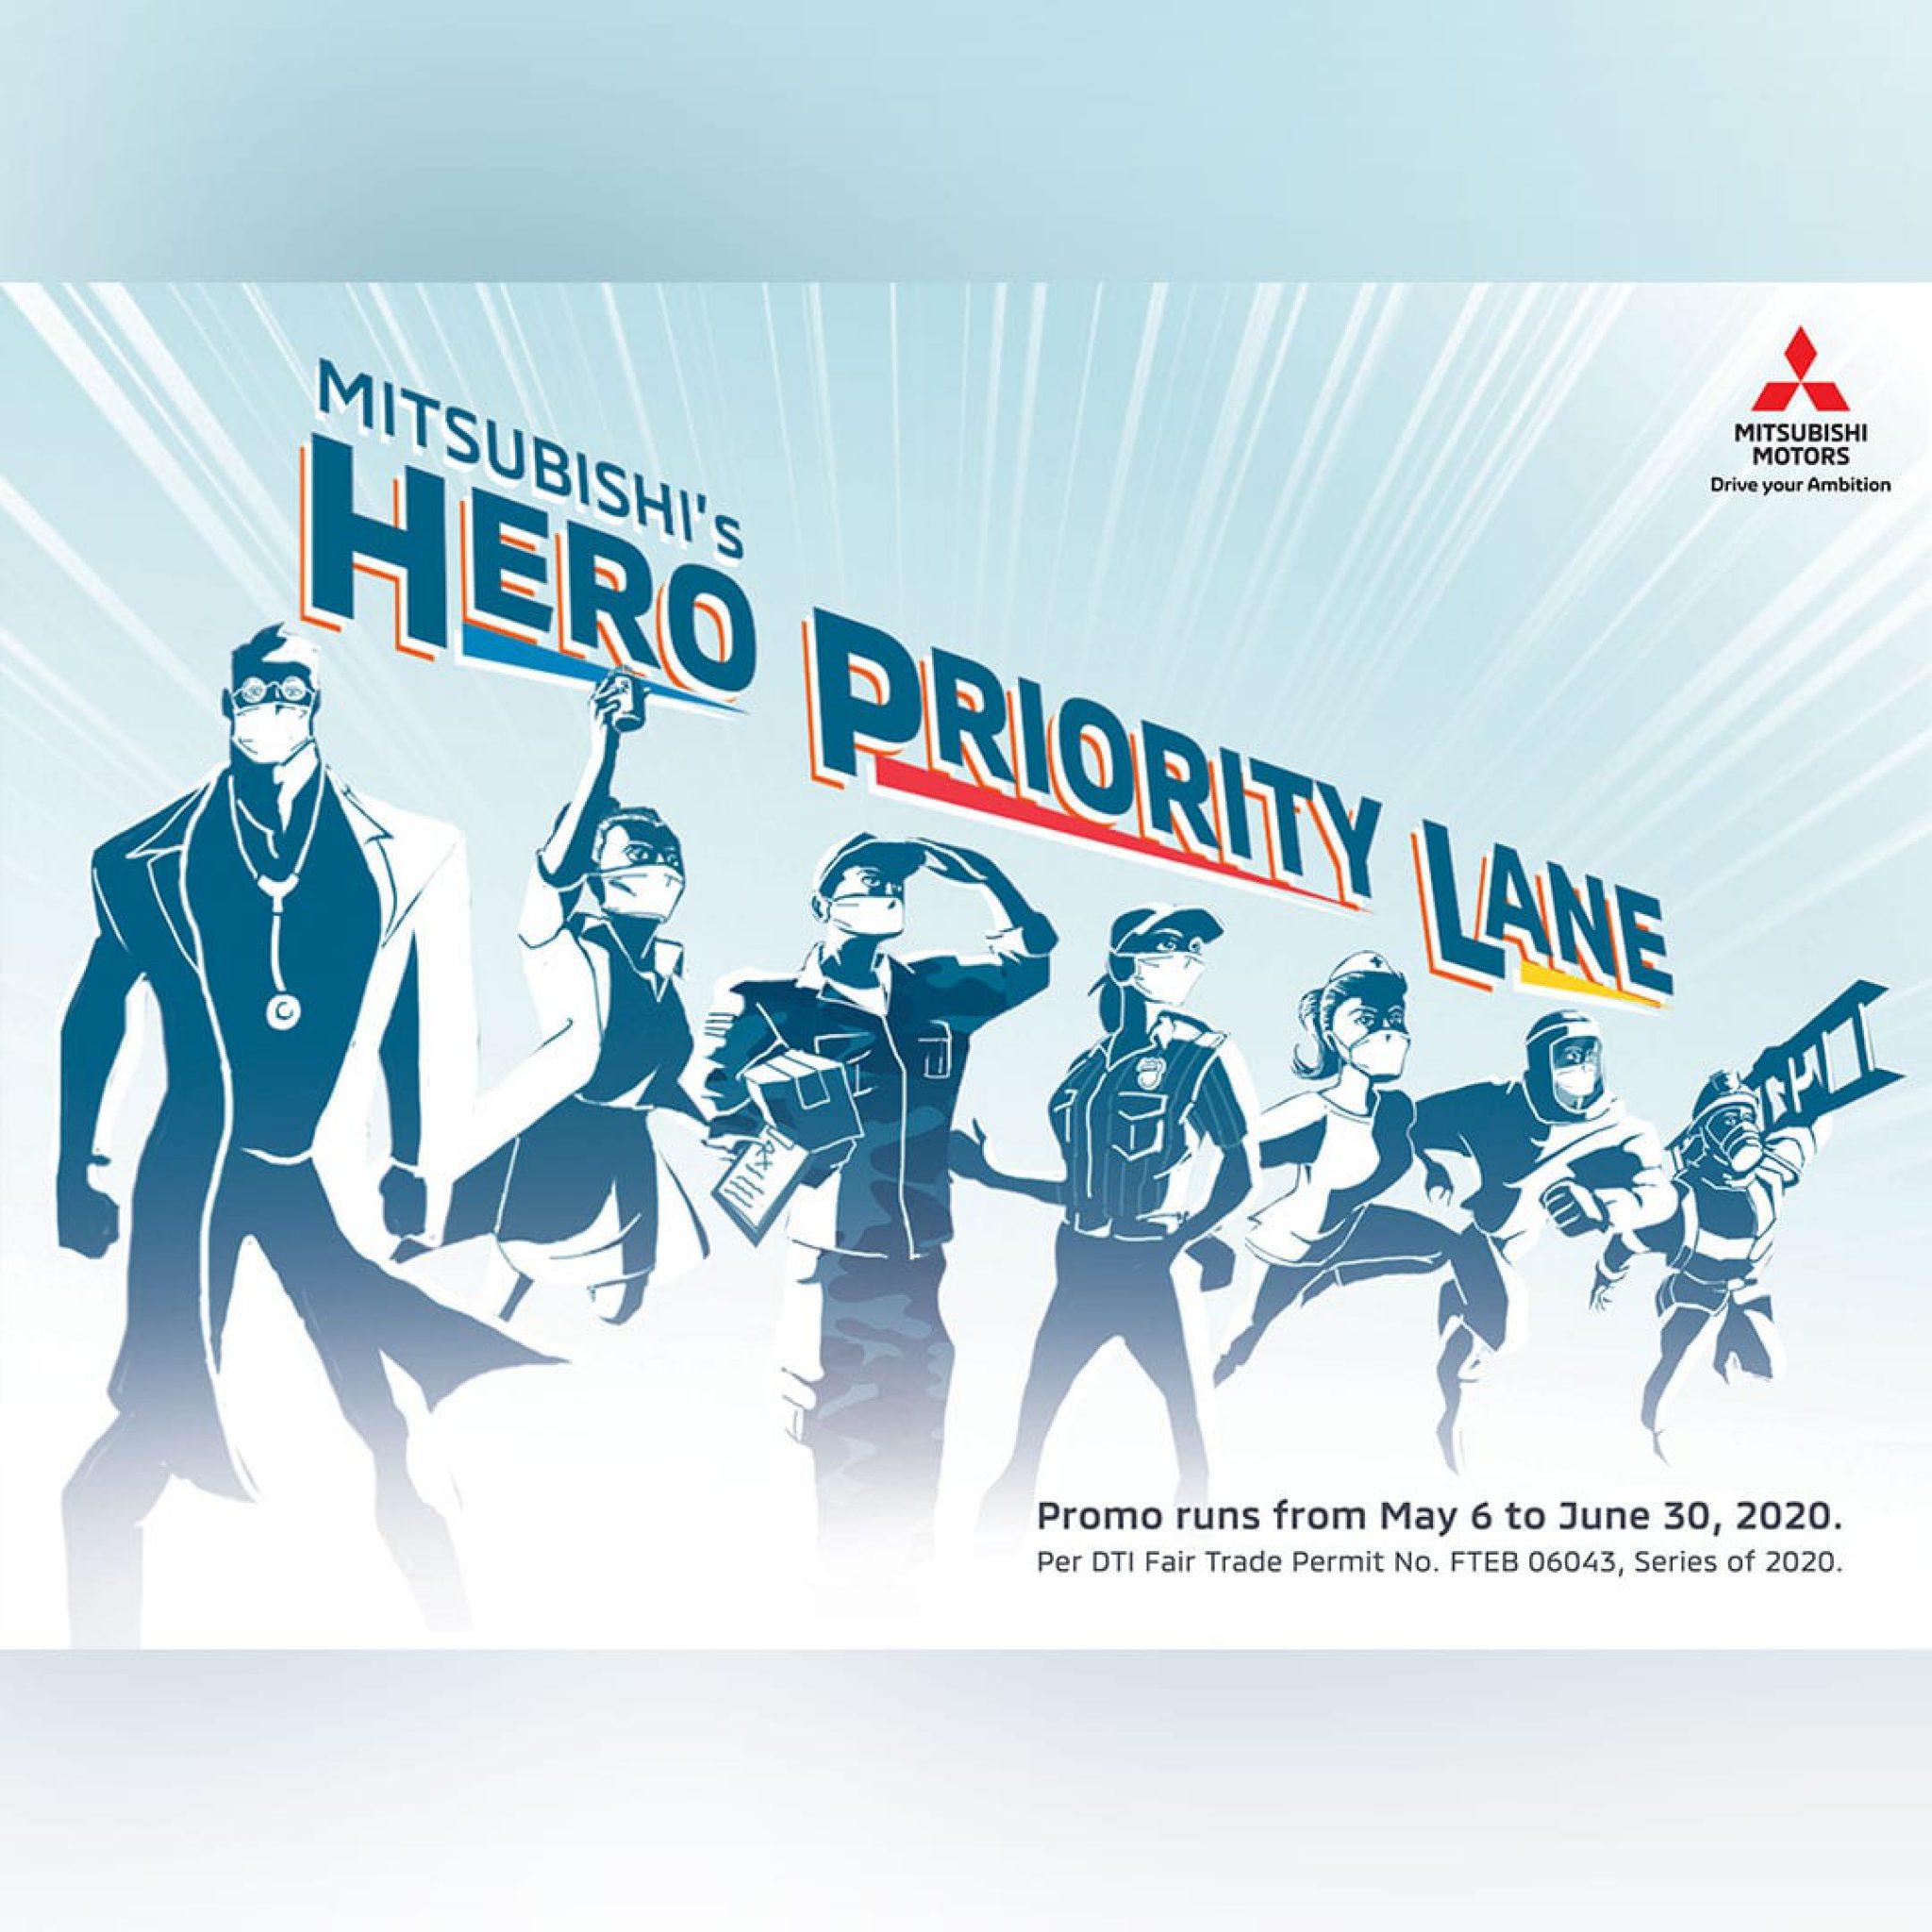 Mitsubishi Hero Priority Lane